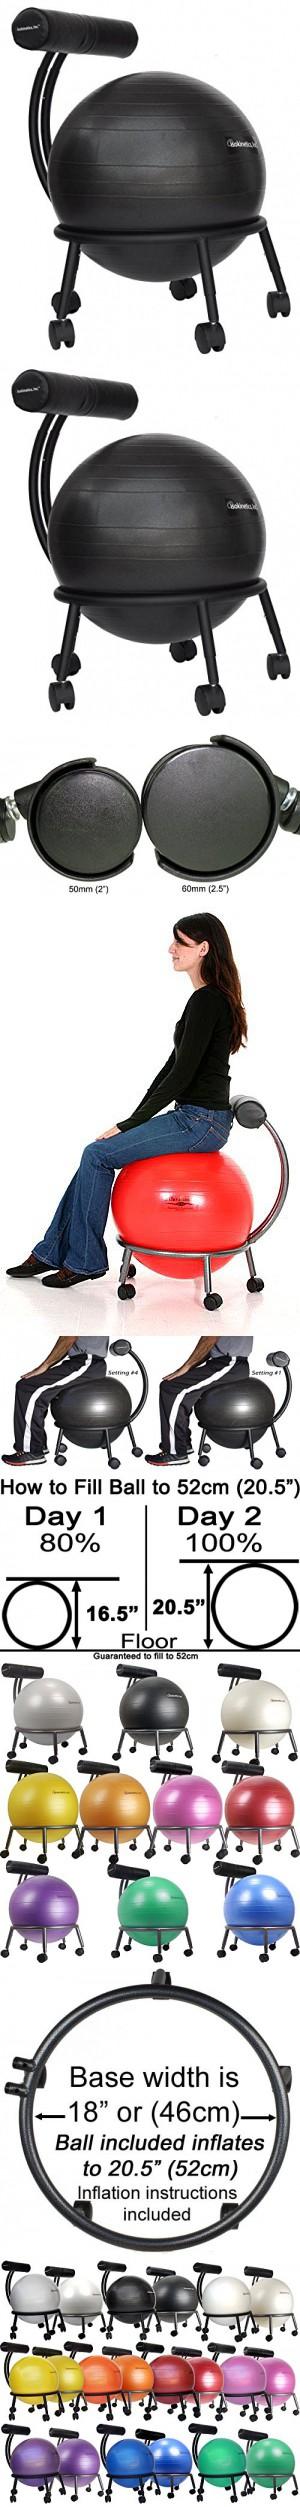 Ball chair & Isokinetics Inc. Brand Fitness Ball Chair - Solid Black Metal Frame ...